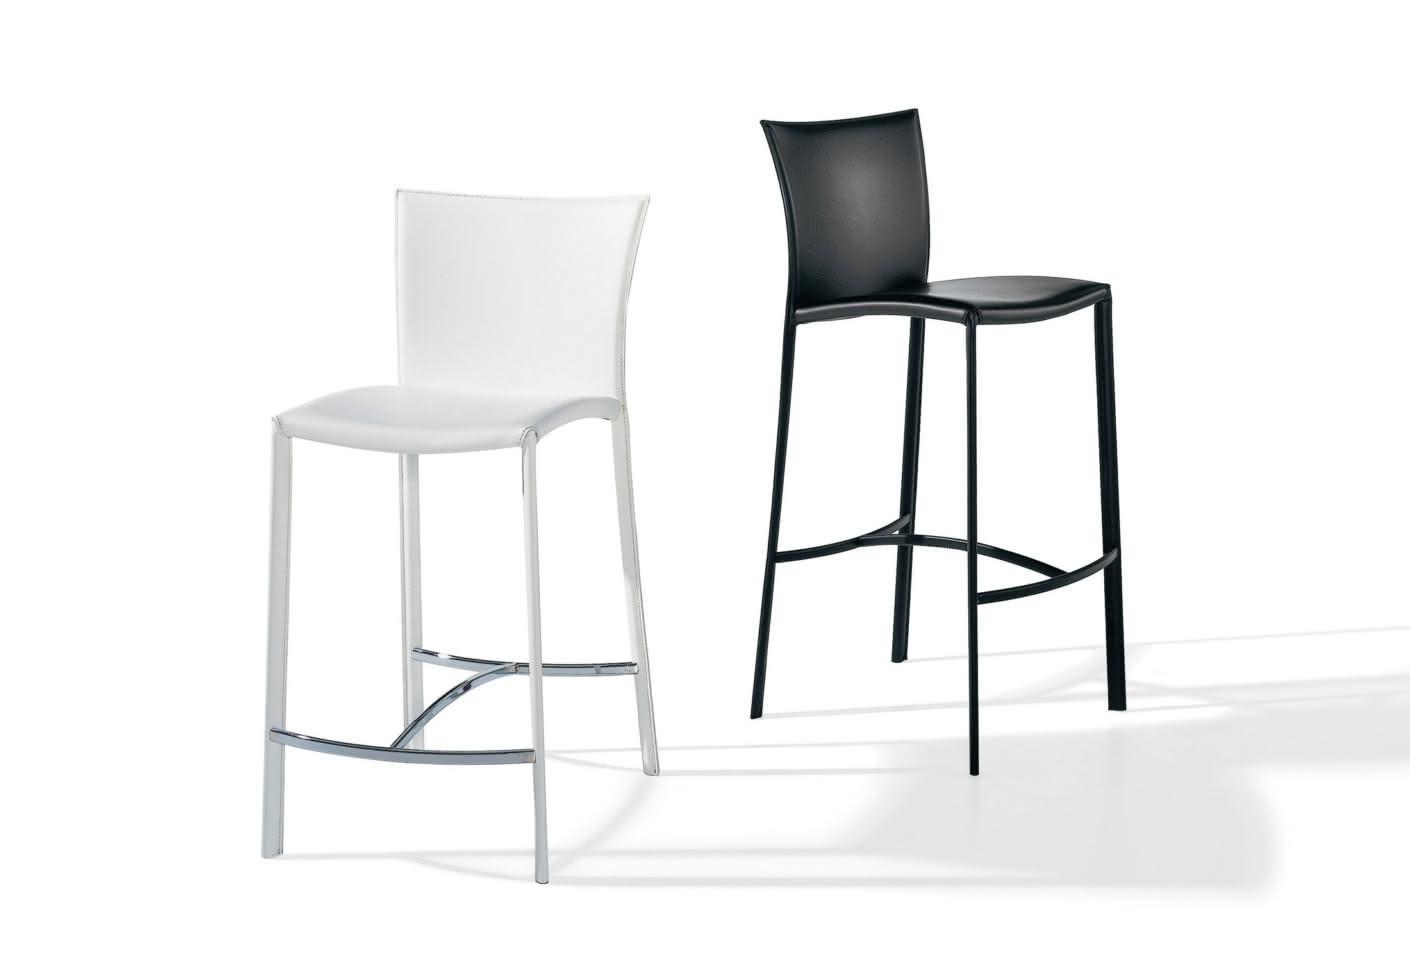 2078 nobile barhocker von draenert stylepark. Black Bedroom Furniture Sets. Home Design Ideas